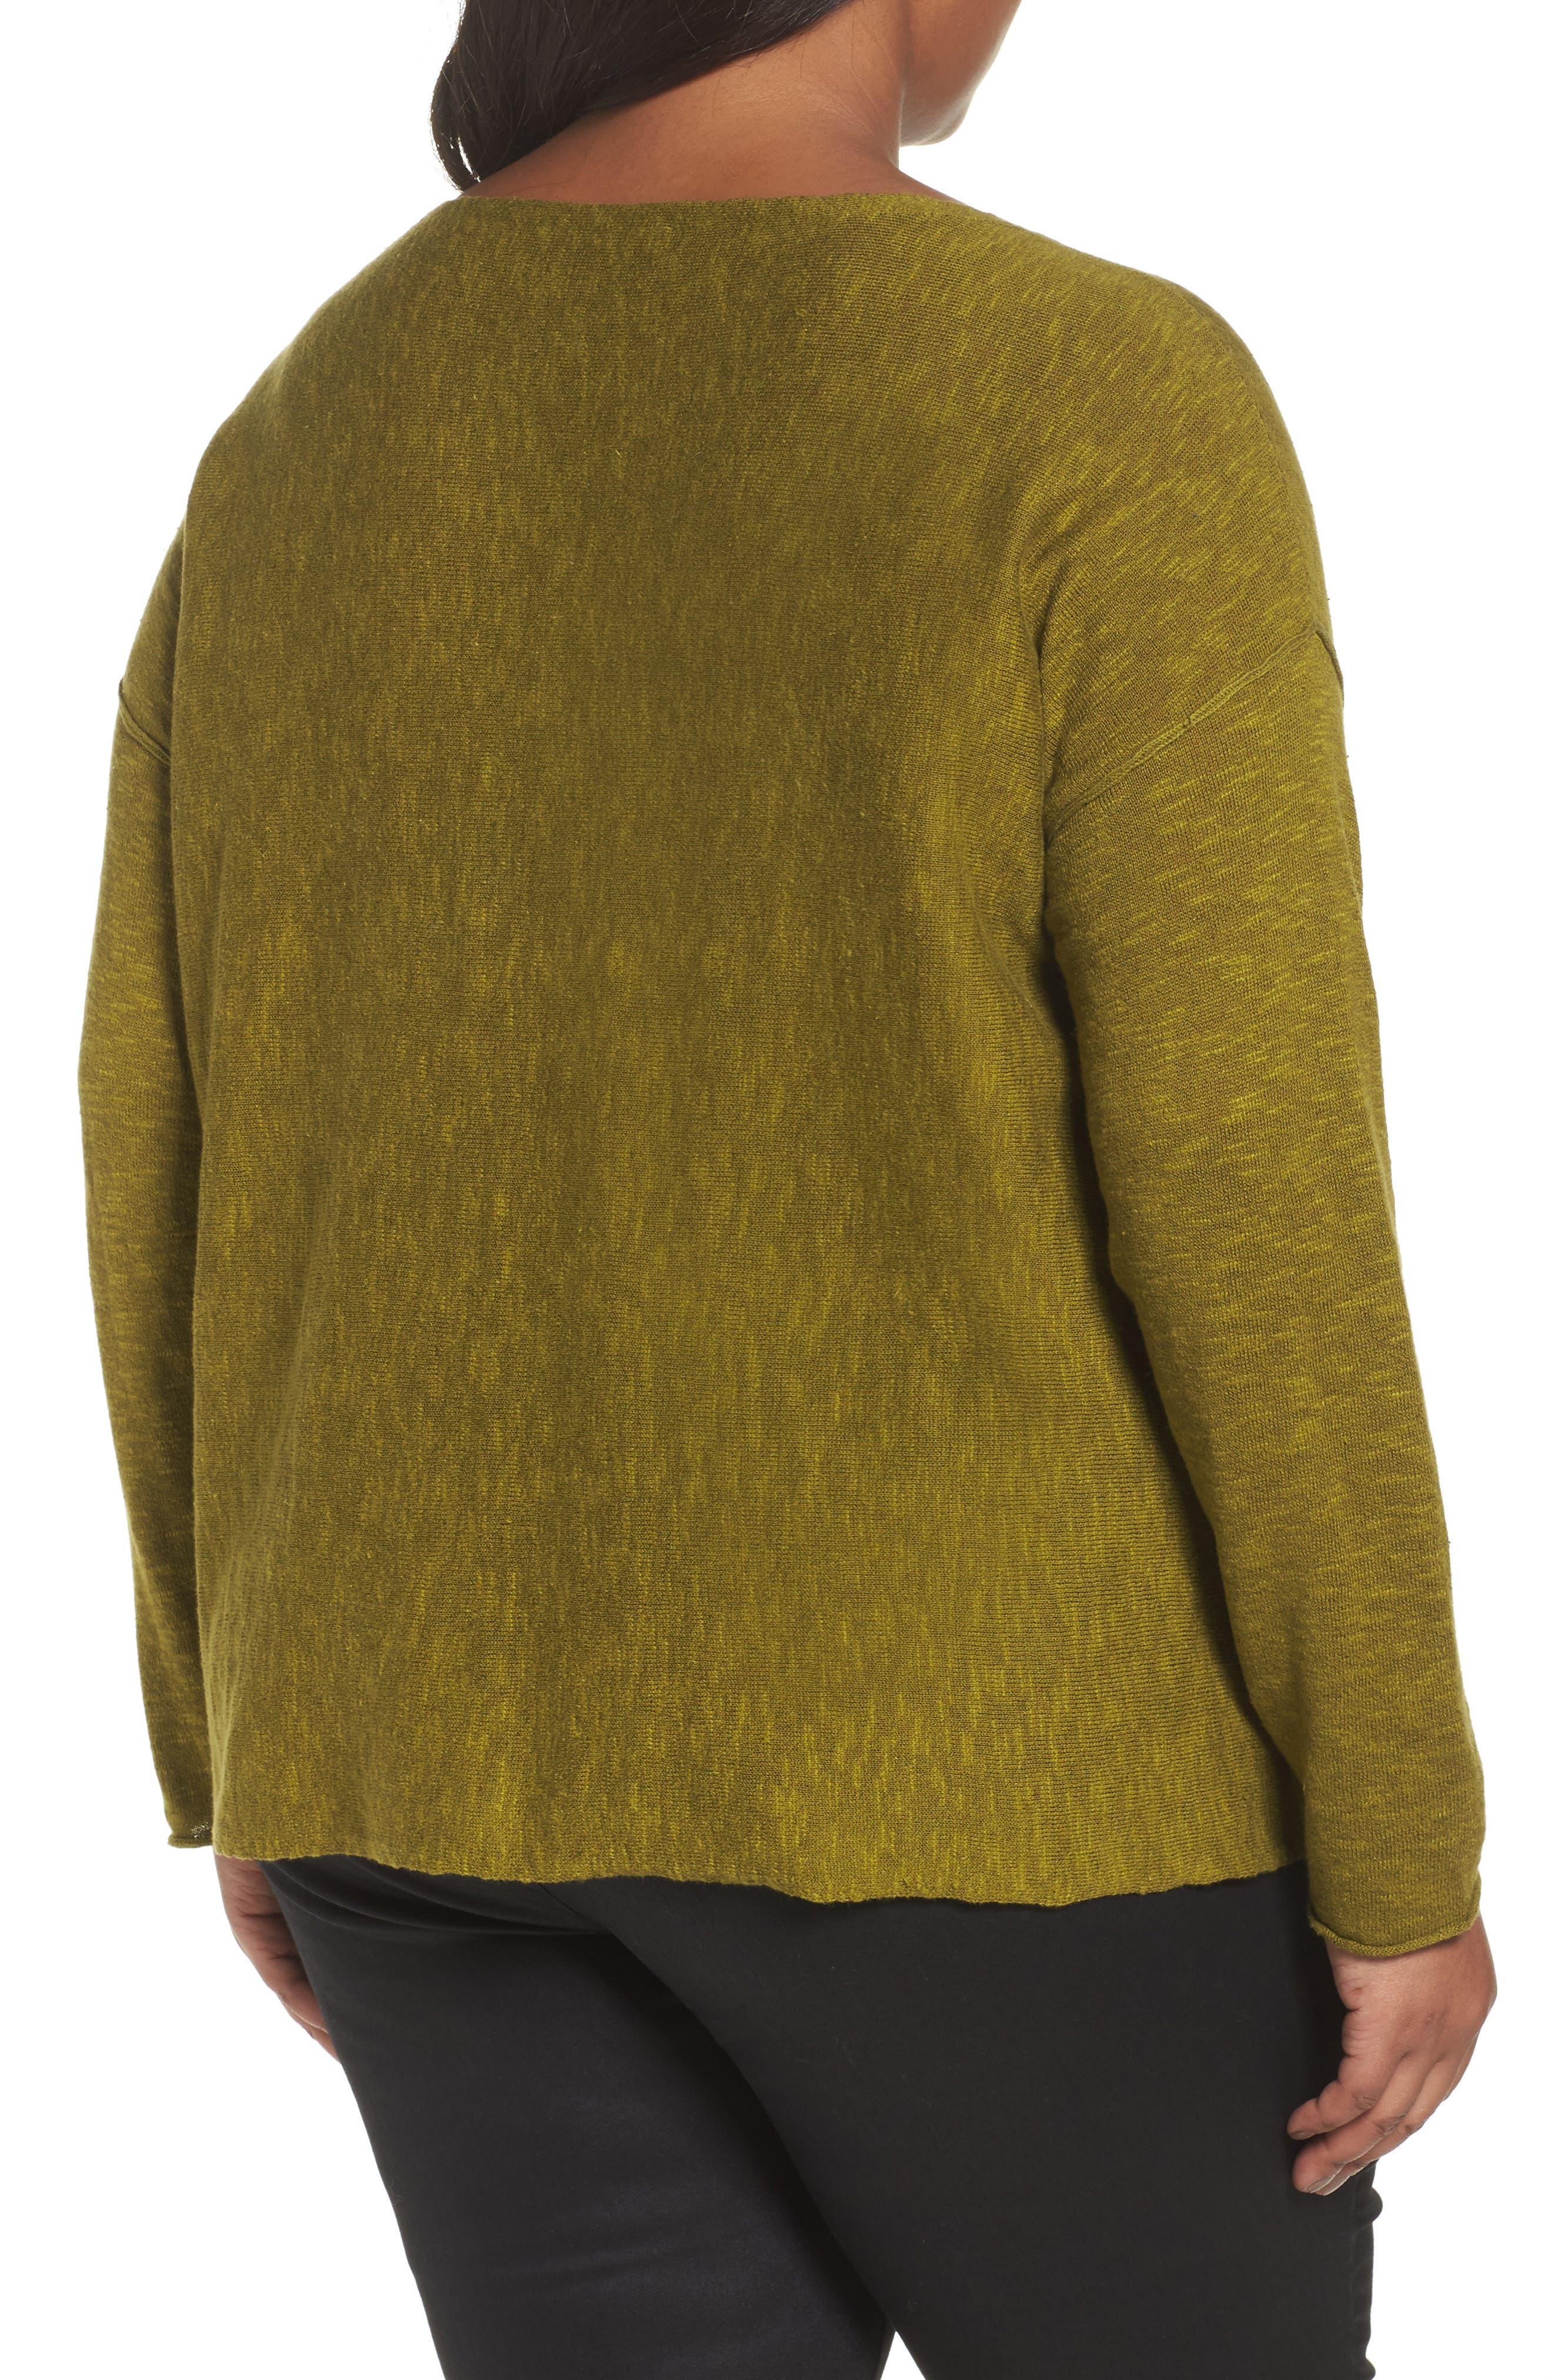 Organic Linen & Cotton Sweater,                             Alternate thumbnail 2, color,                             201